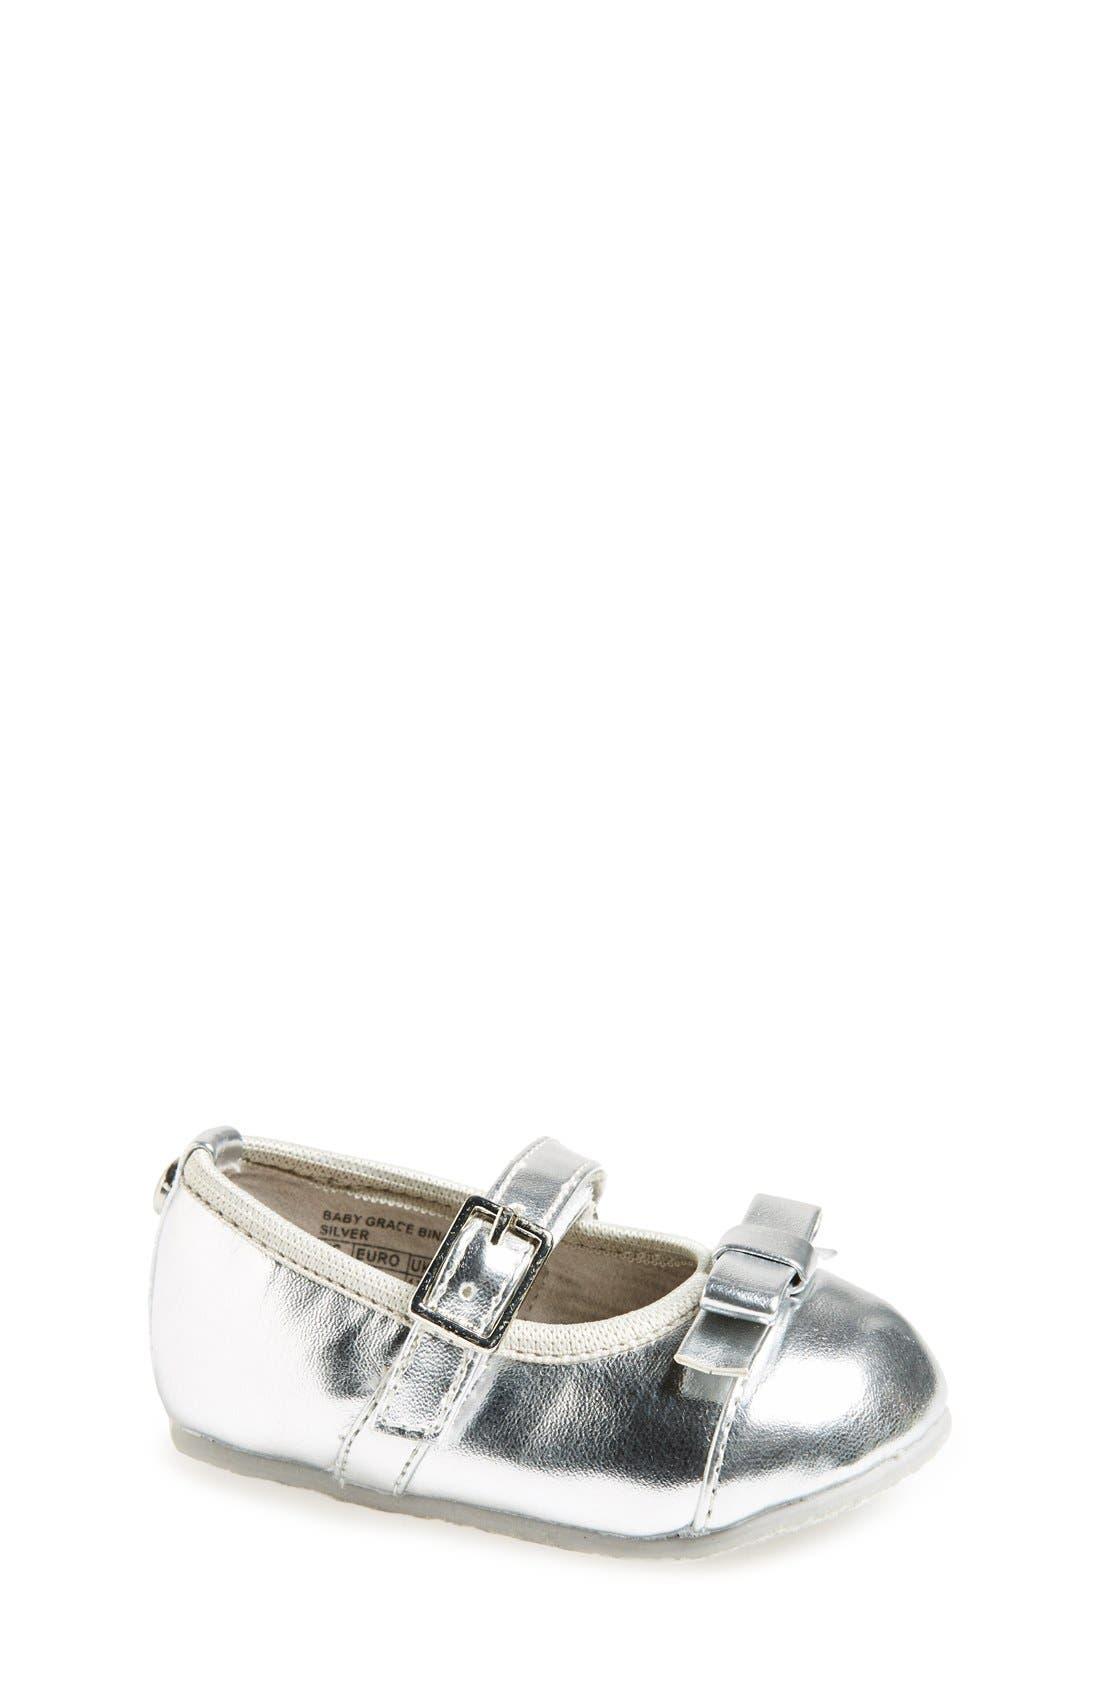 Main Image - MICHAEL Michael Kors 'Grace Bina' Mary Jane Crib Shoe (Baby)